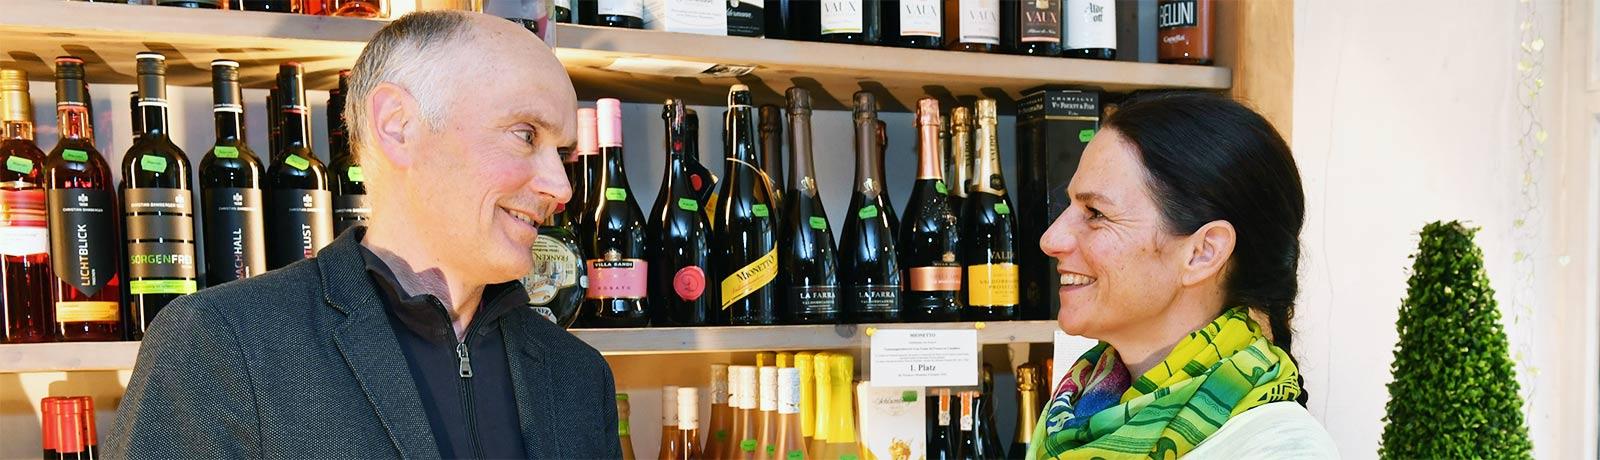 Beratung bei De Crignis Wein